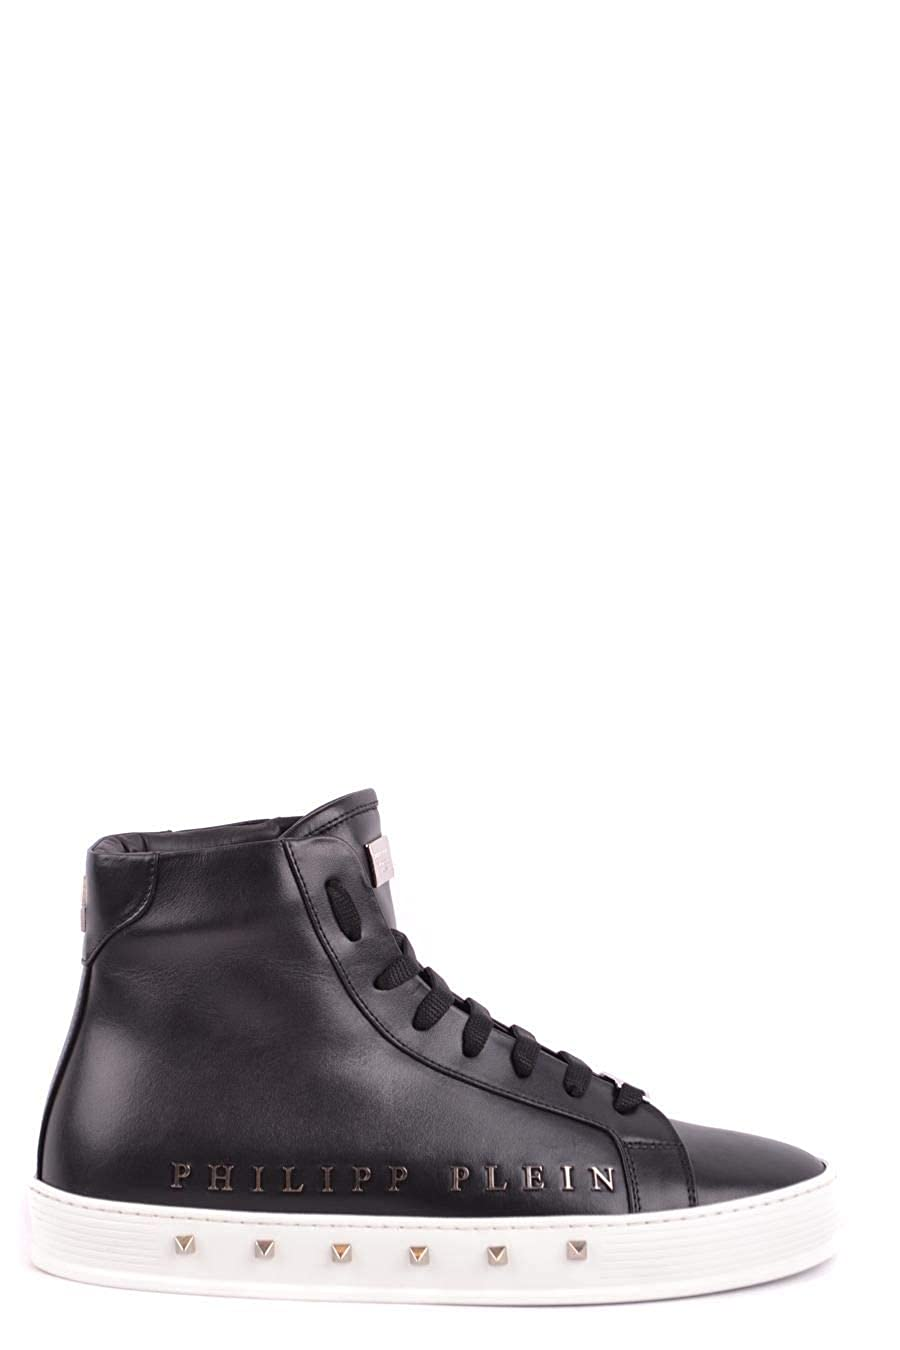 - Philipp Plein Hombre MSC1245PLE075N0291 negro Cuero zapatos